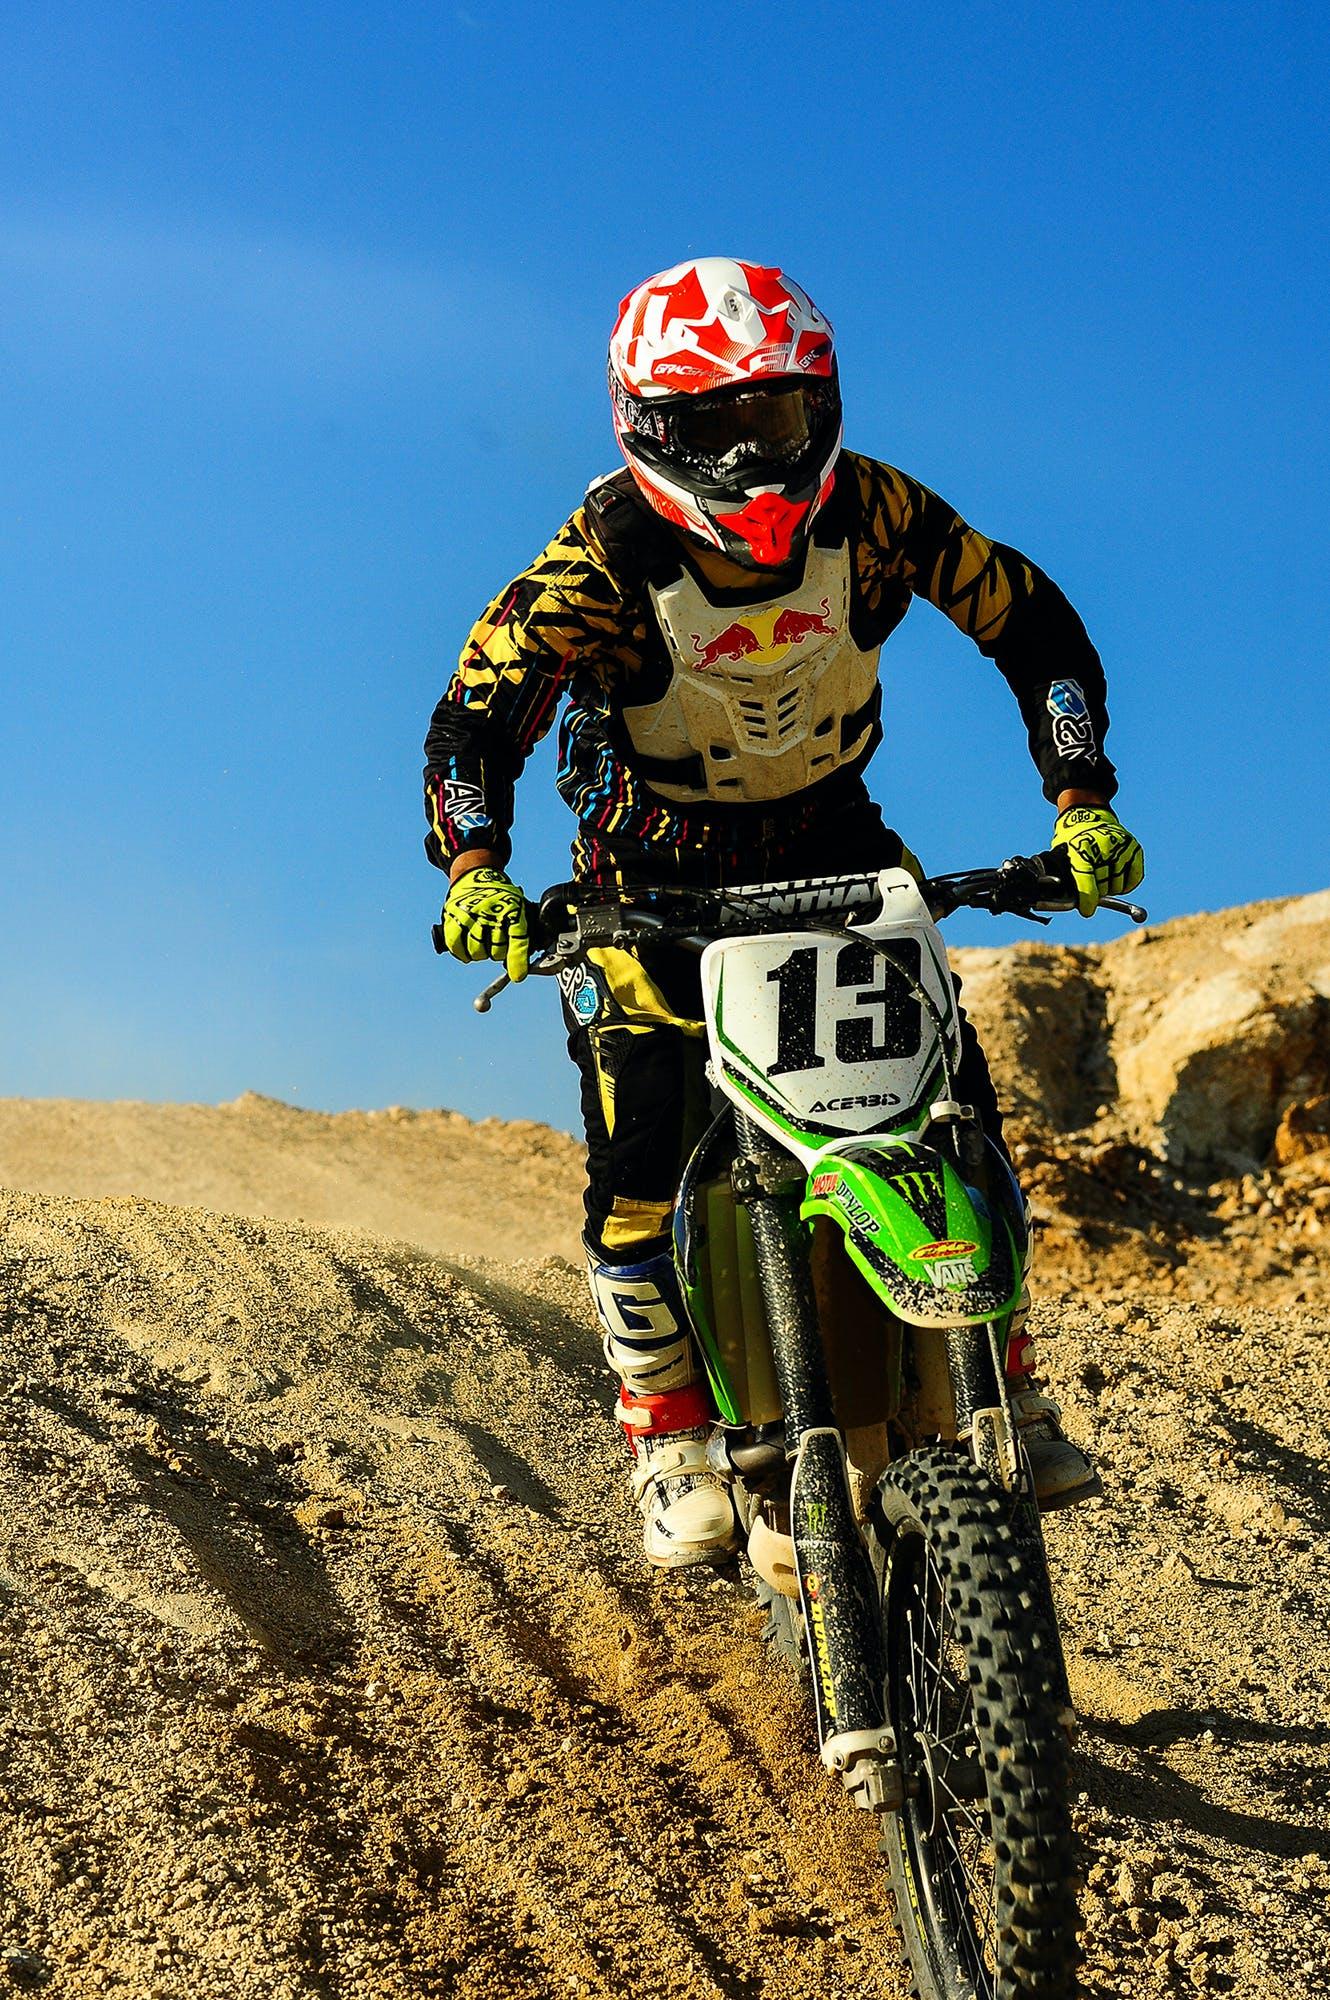 Man Riding Motocross Dirt Bike on Hill